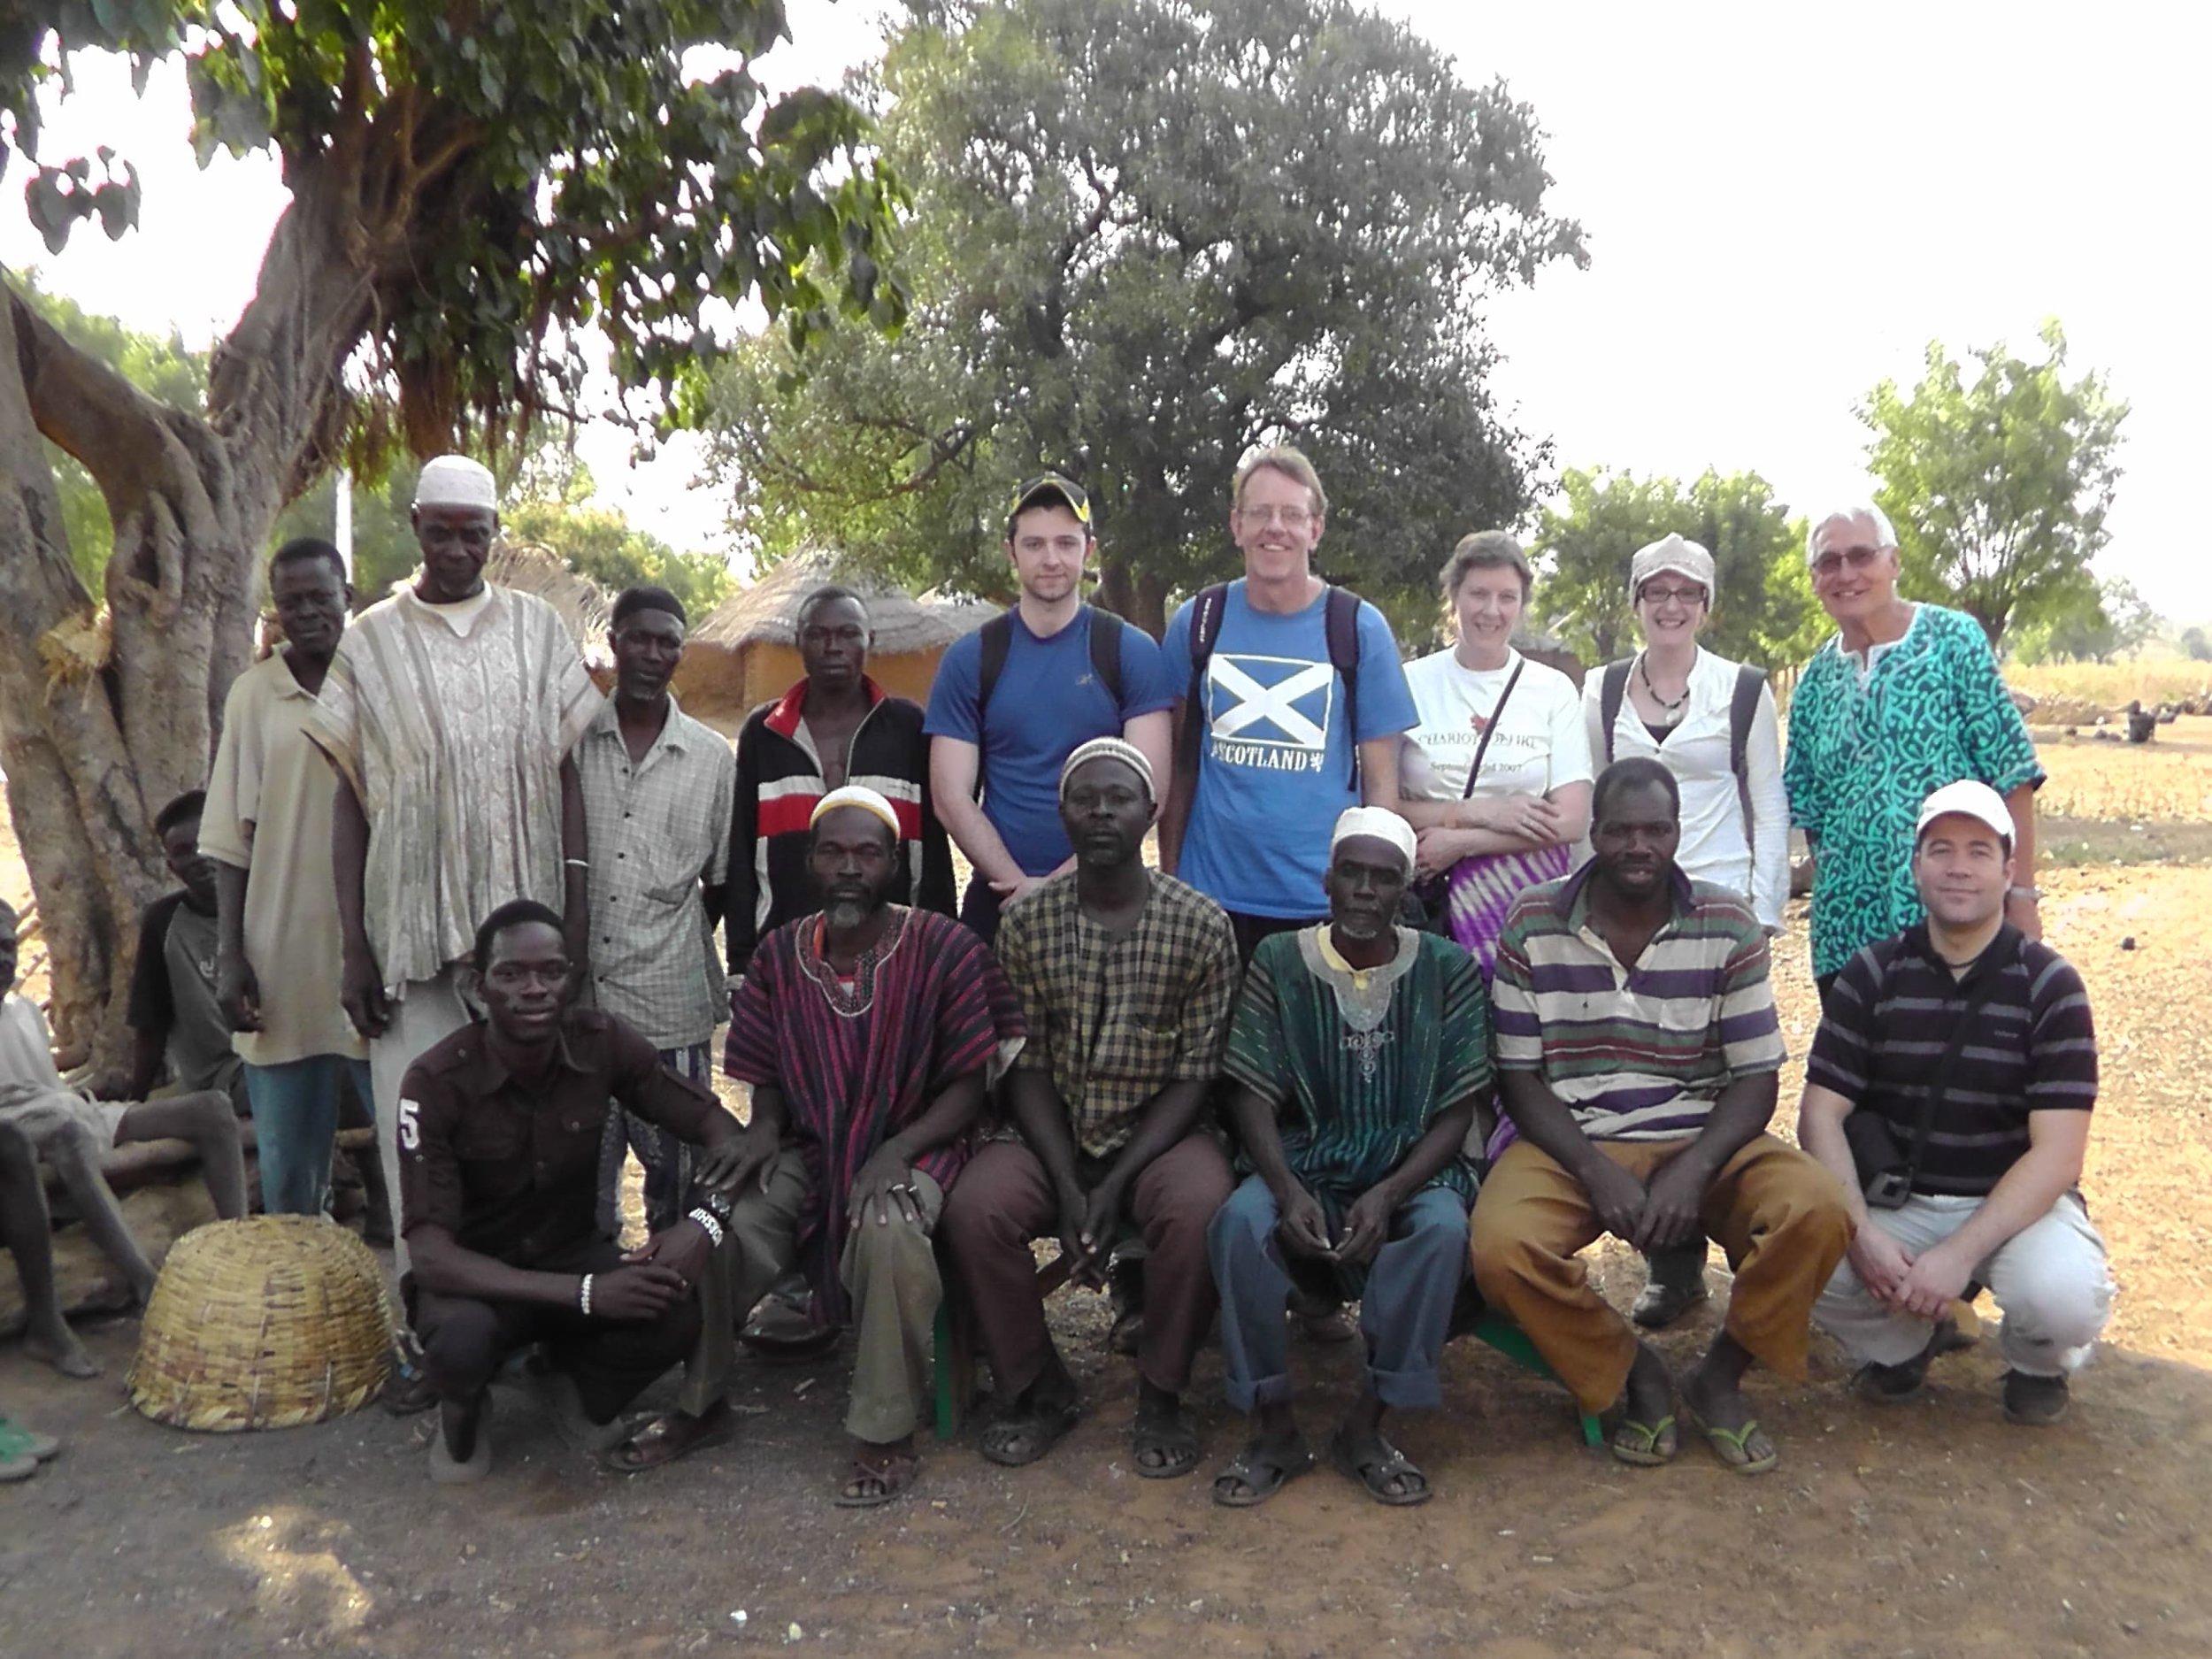 ghana-expedition-jan-2013-update-1-min.jpg